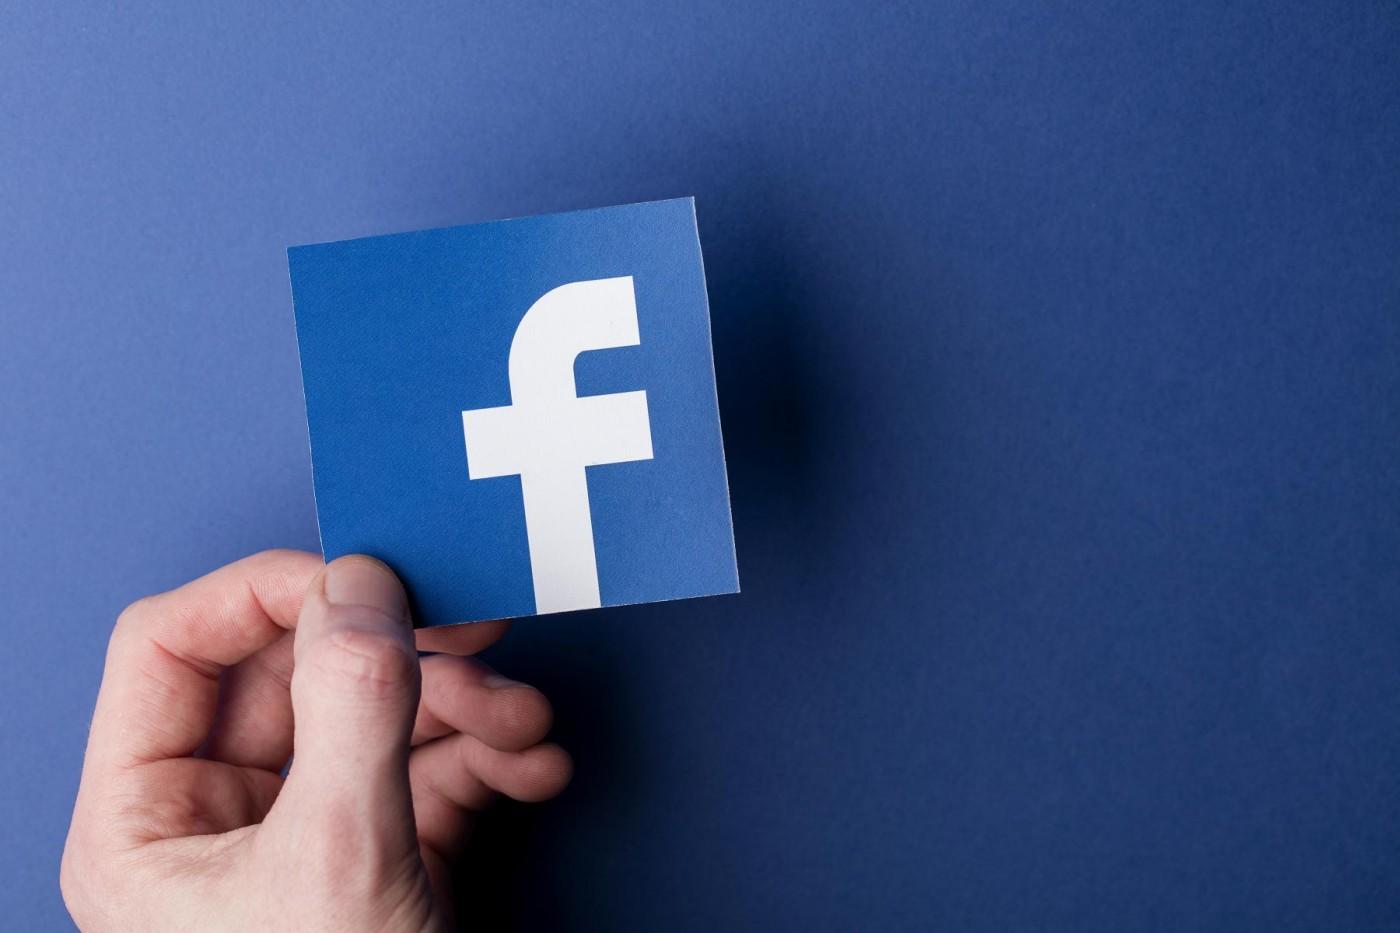 Facebook社團貼文故障、社團貼文壞掉怎麼辦?爬文無法看到最新,原來是這個在搞鬼!?